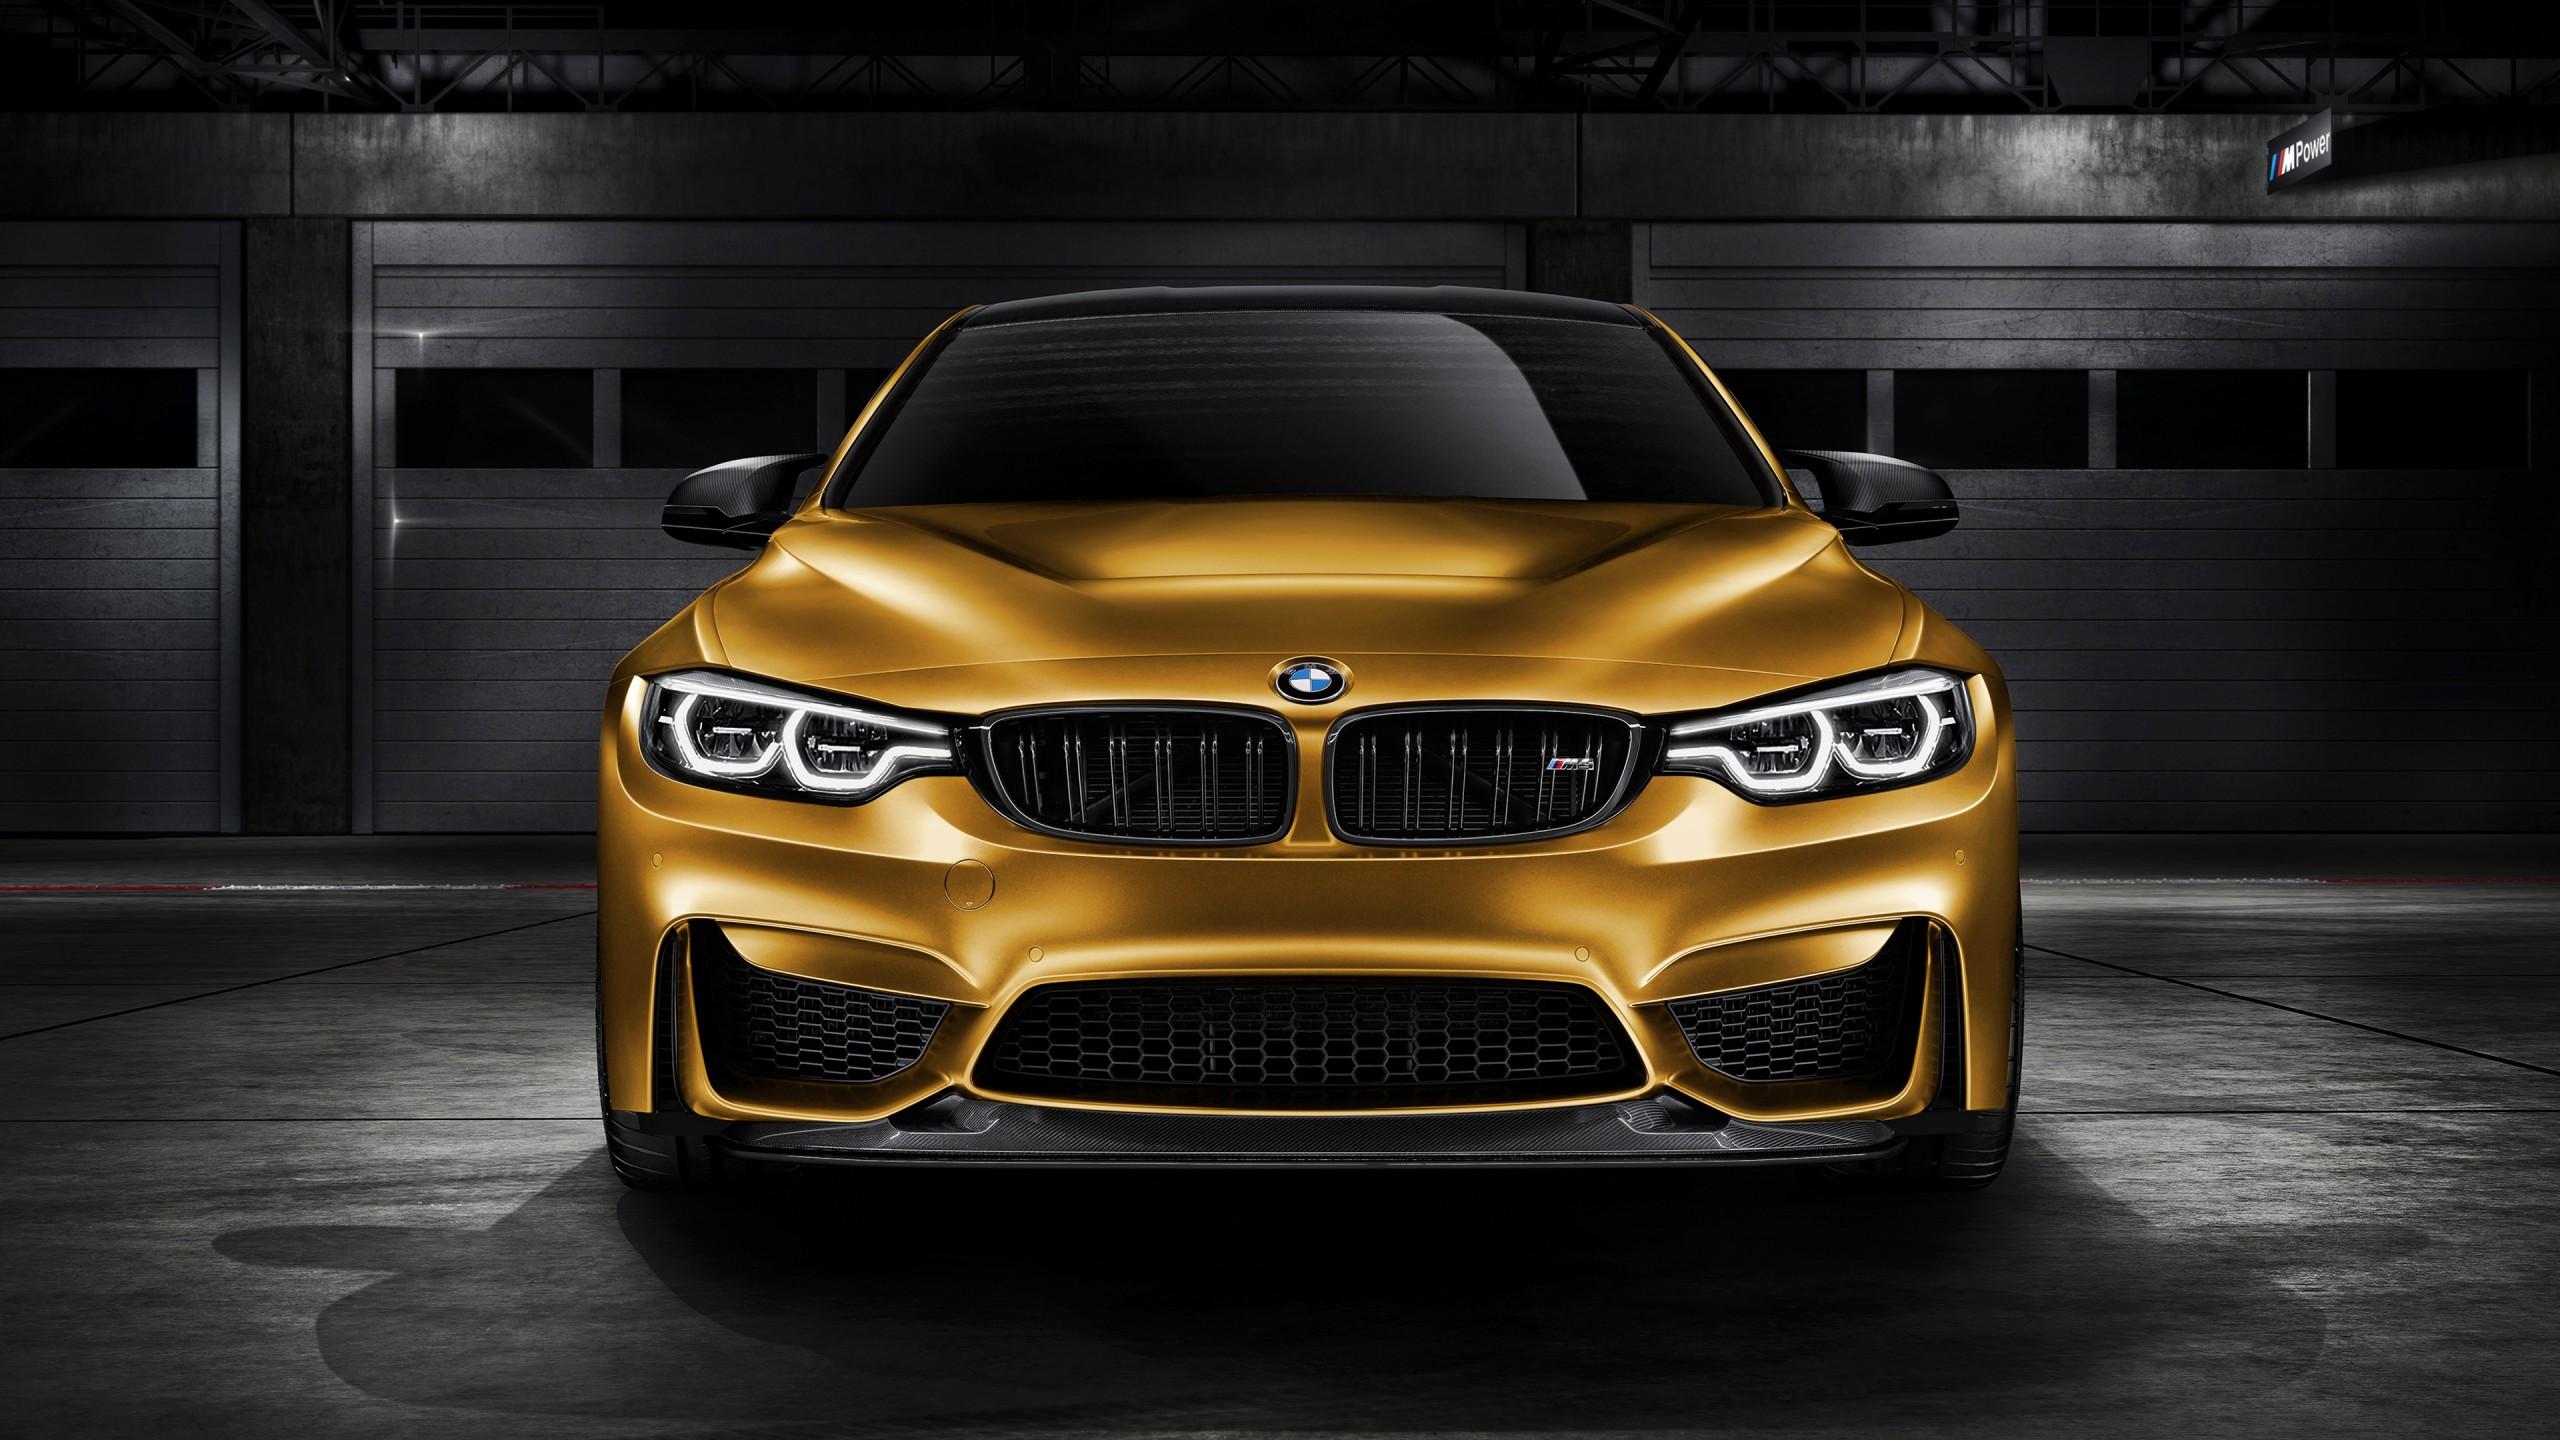 Gold Iphone X Wallpaper Bmw M4 Gts Sunburstgold 2018 4k Wallpaper Hd Car